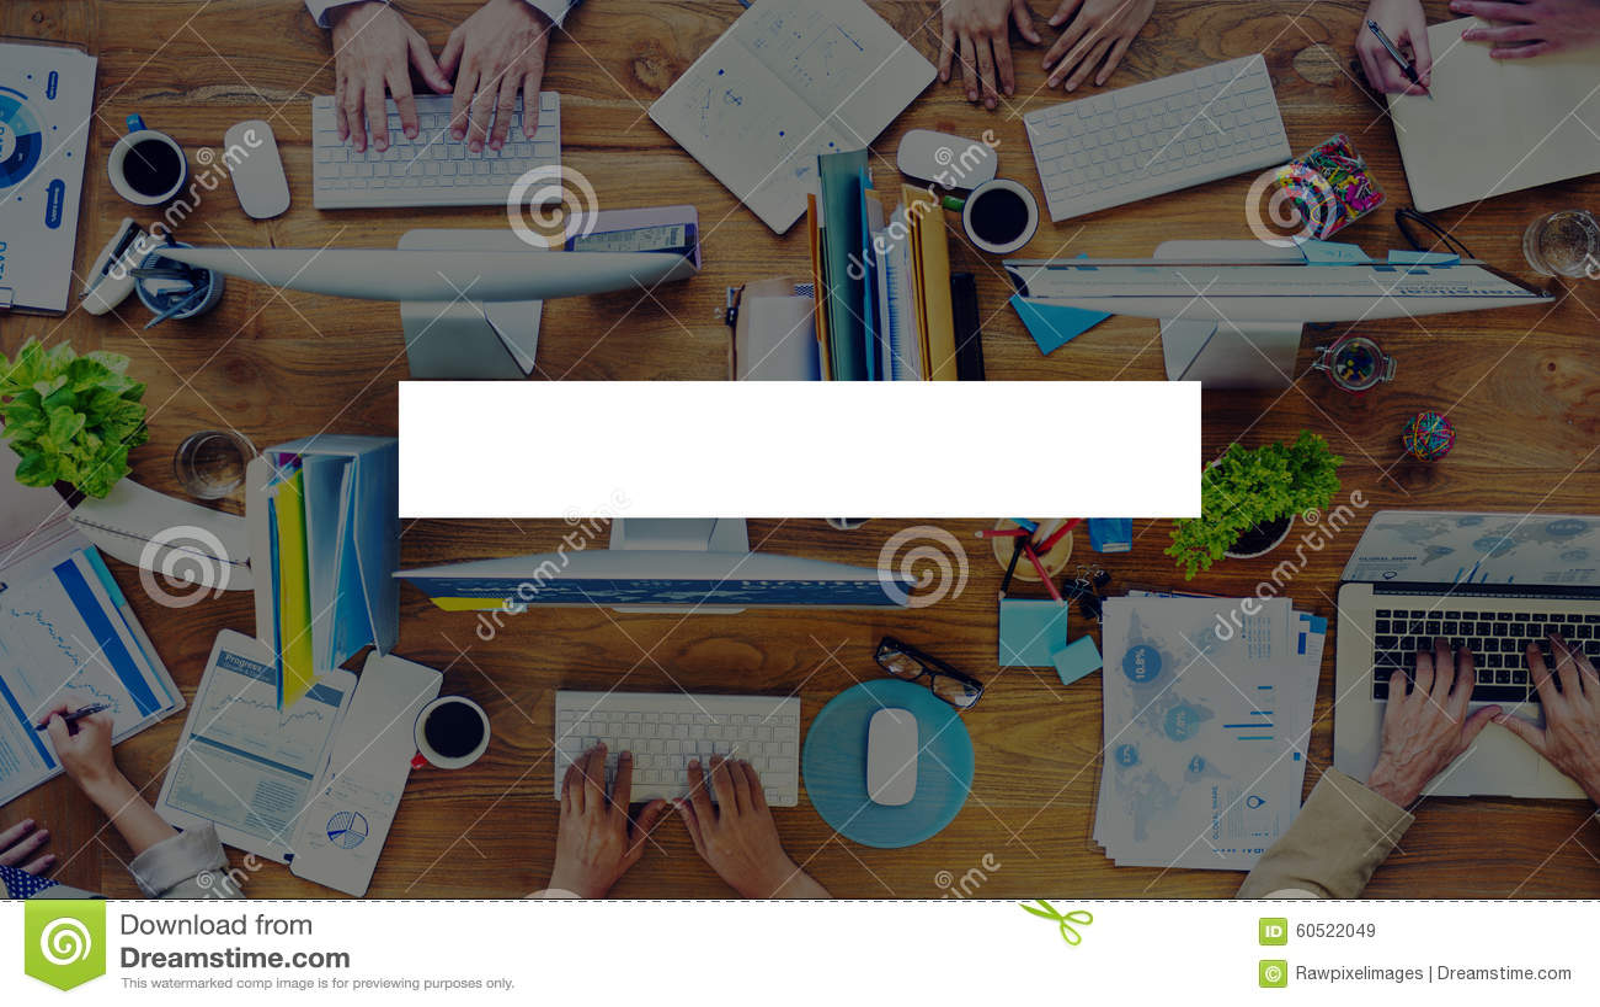 Rectangle Copy Space Bar Blank Rectangular Concept Stock Image